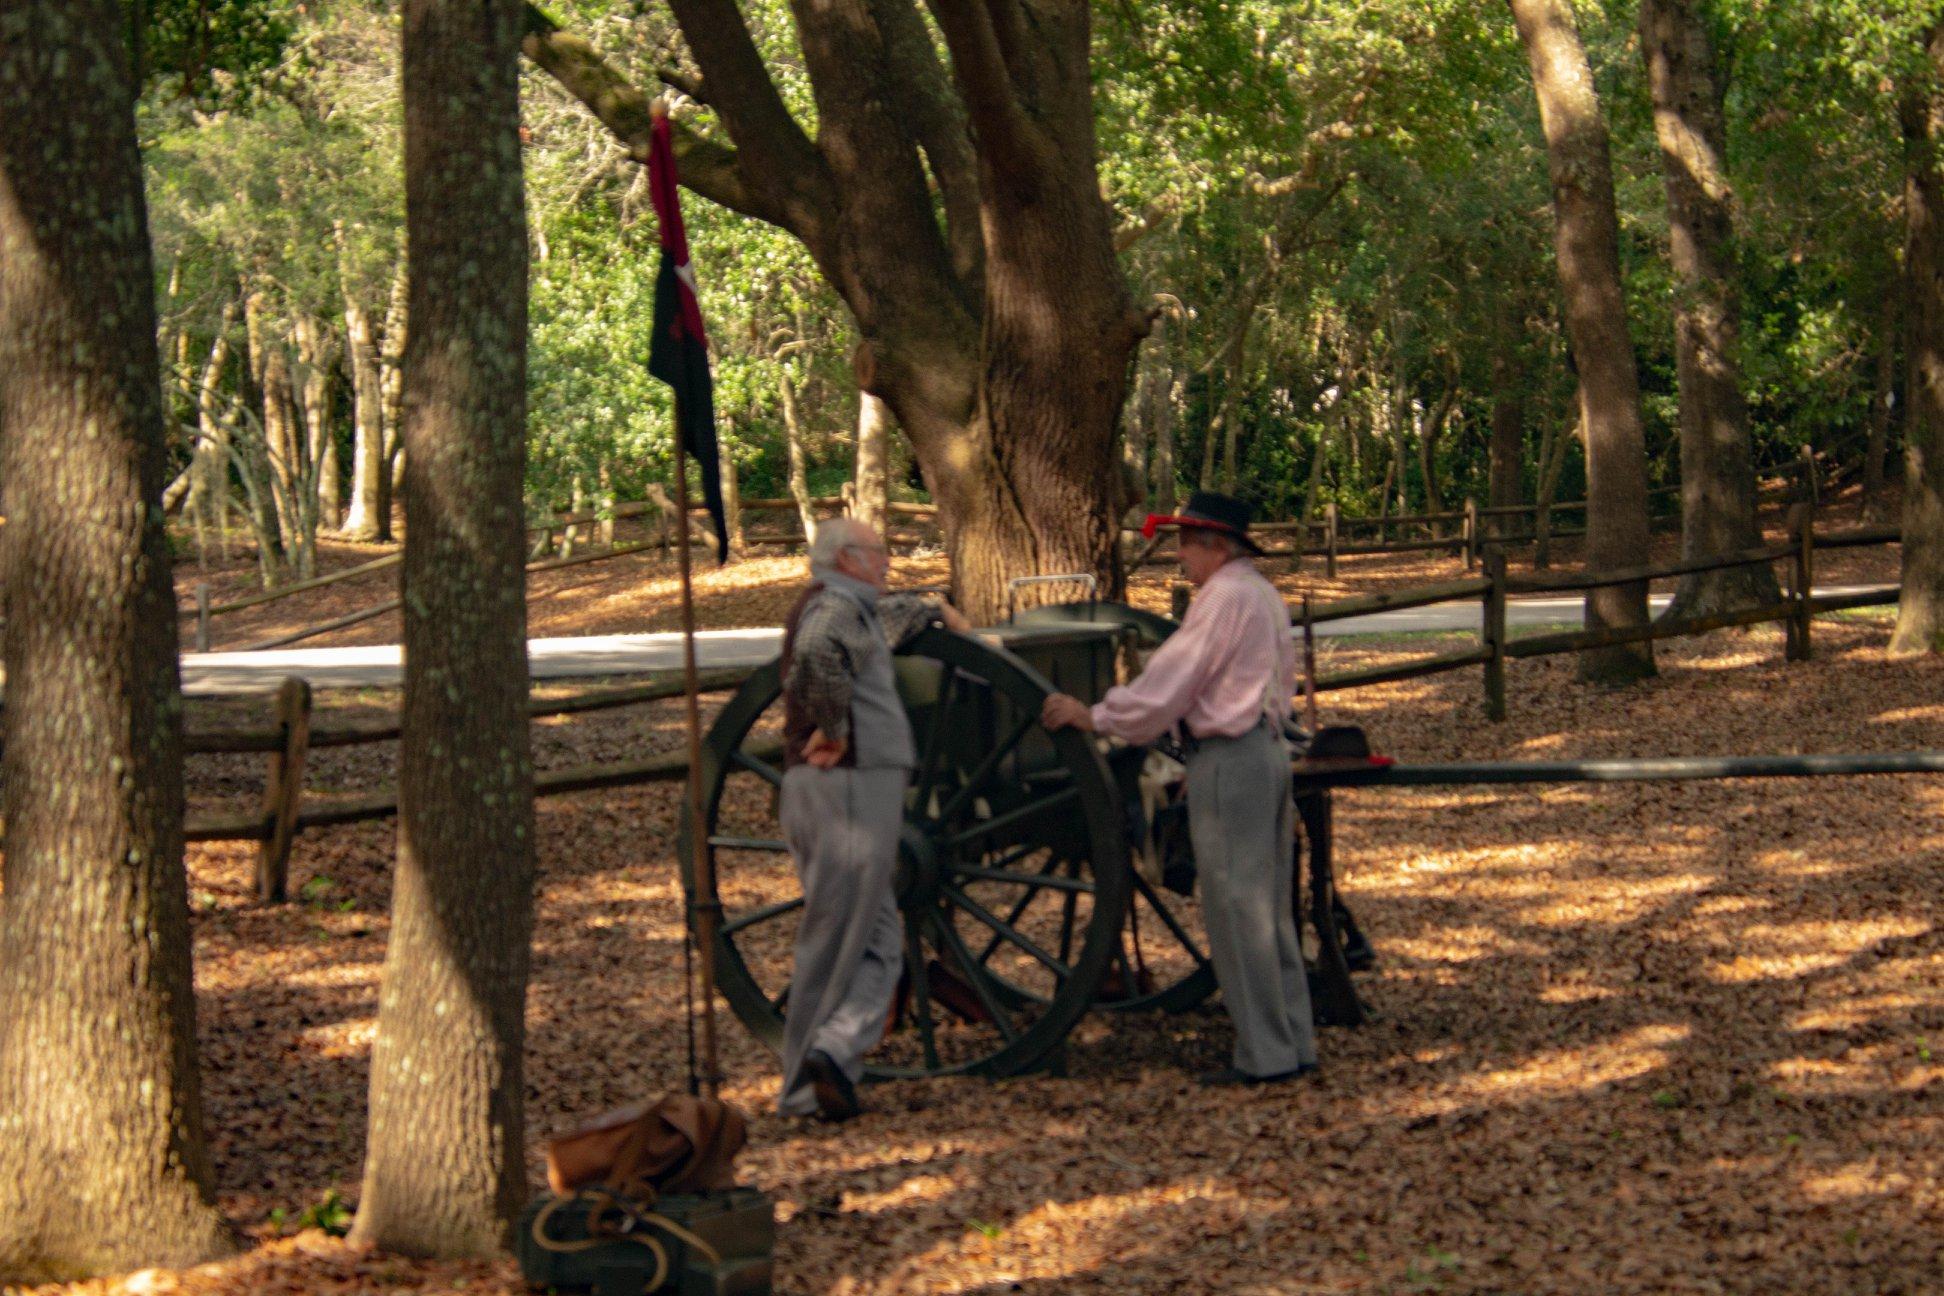 The annual anniversary of the Battle of Secessionville 4